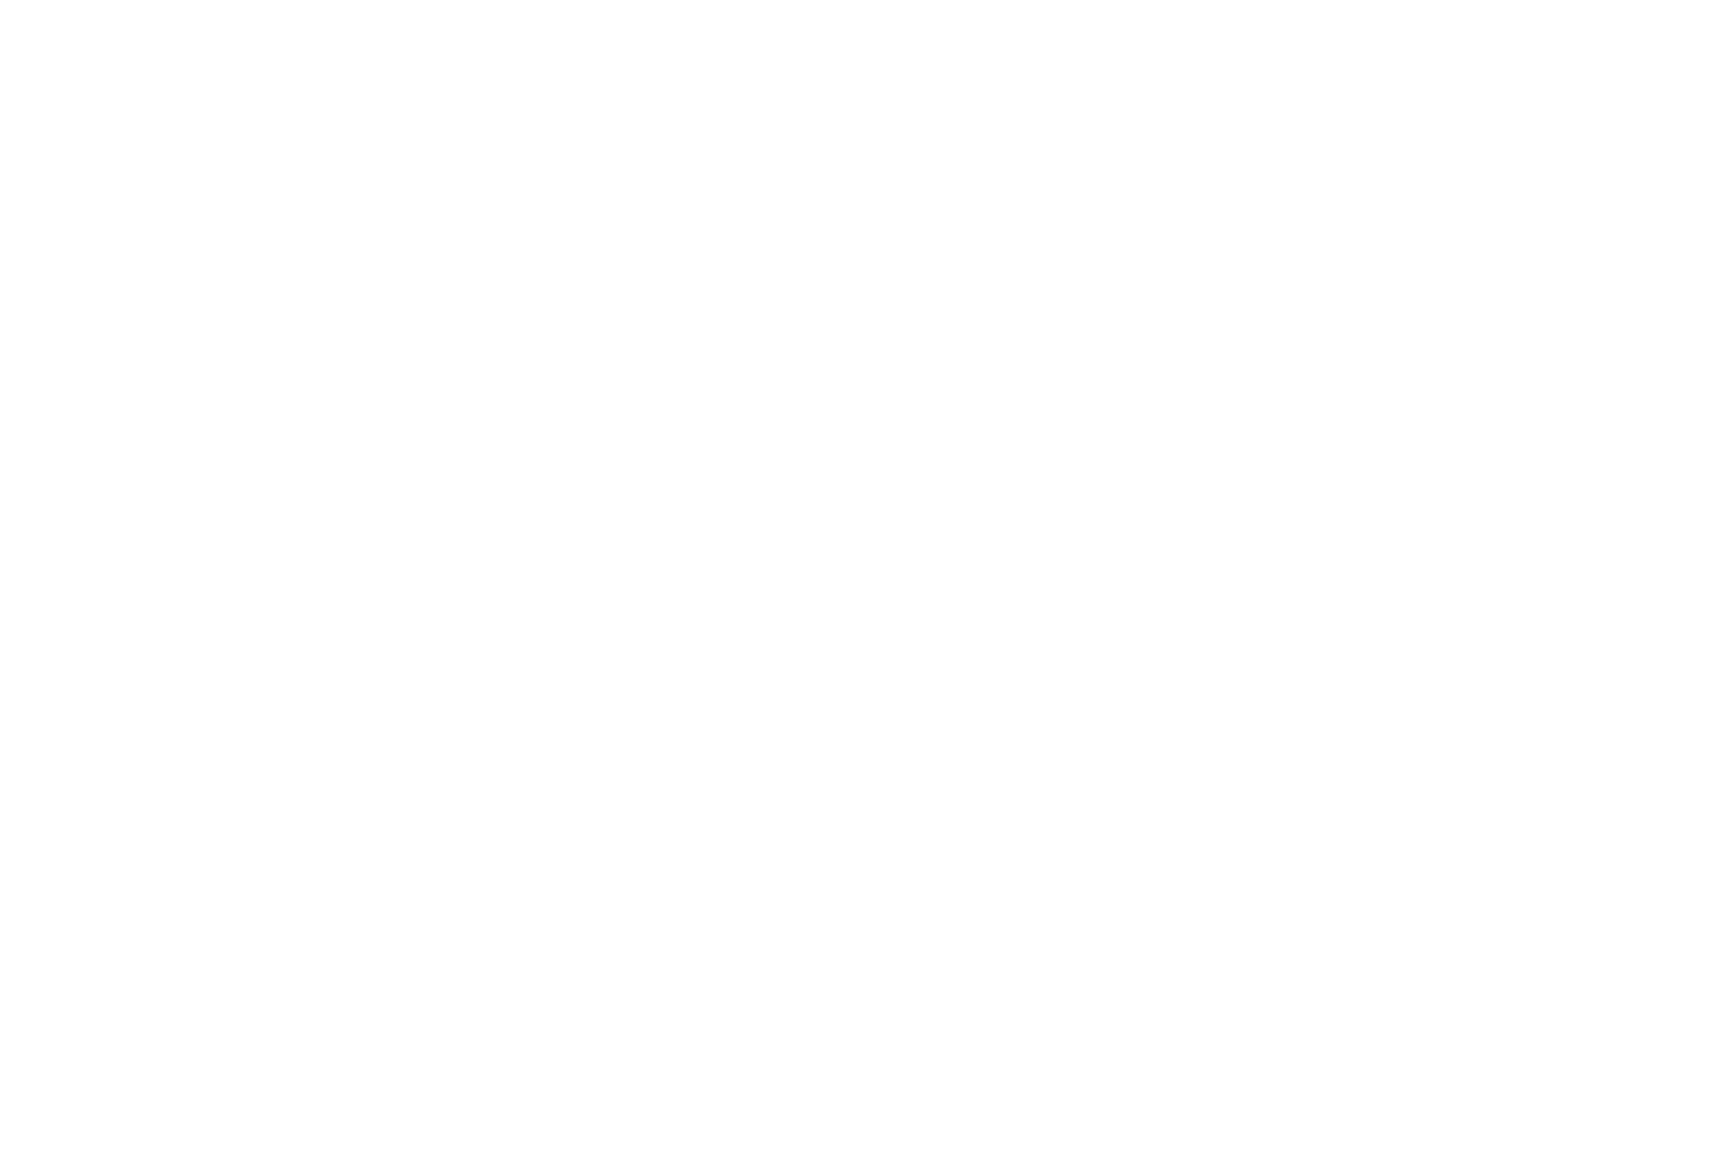 WINNER - Direct Monthly Online Film Festival - Best LGBT - Dec 17.png